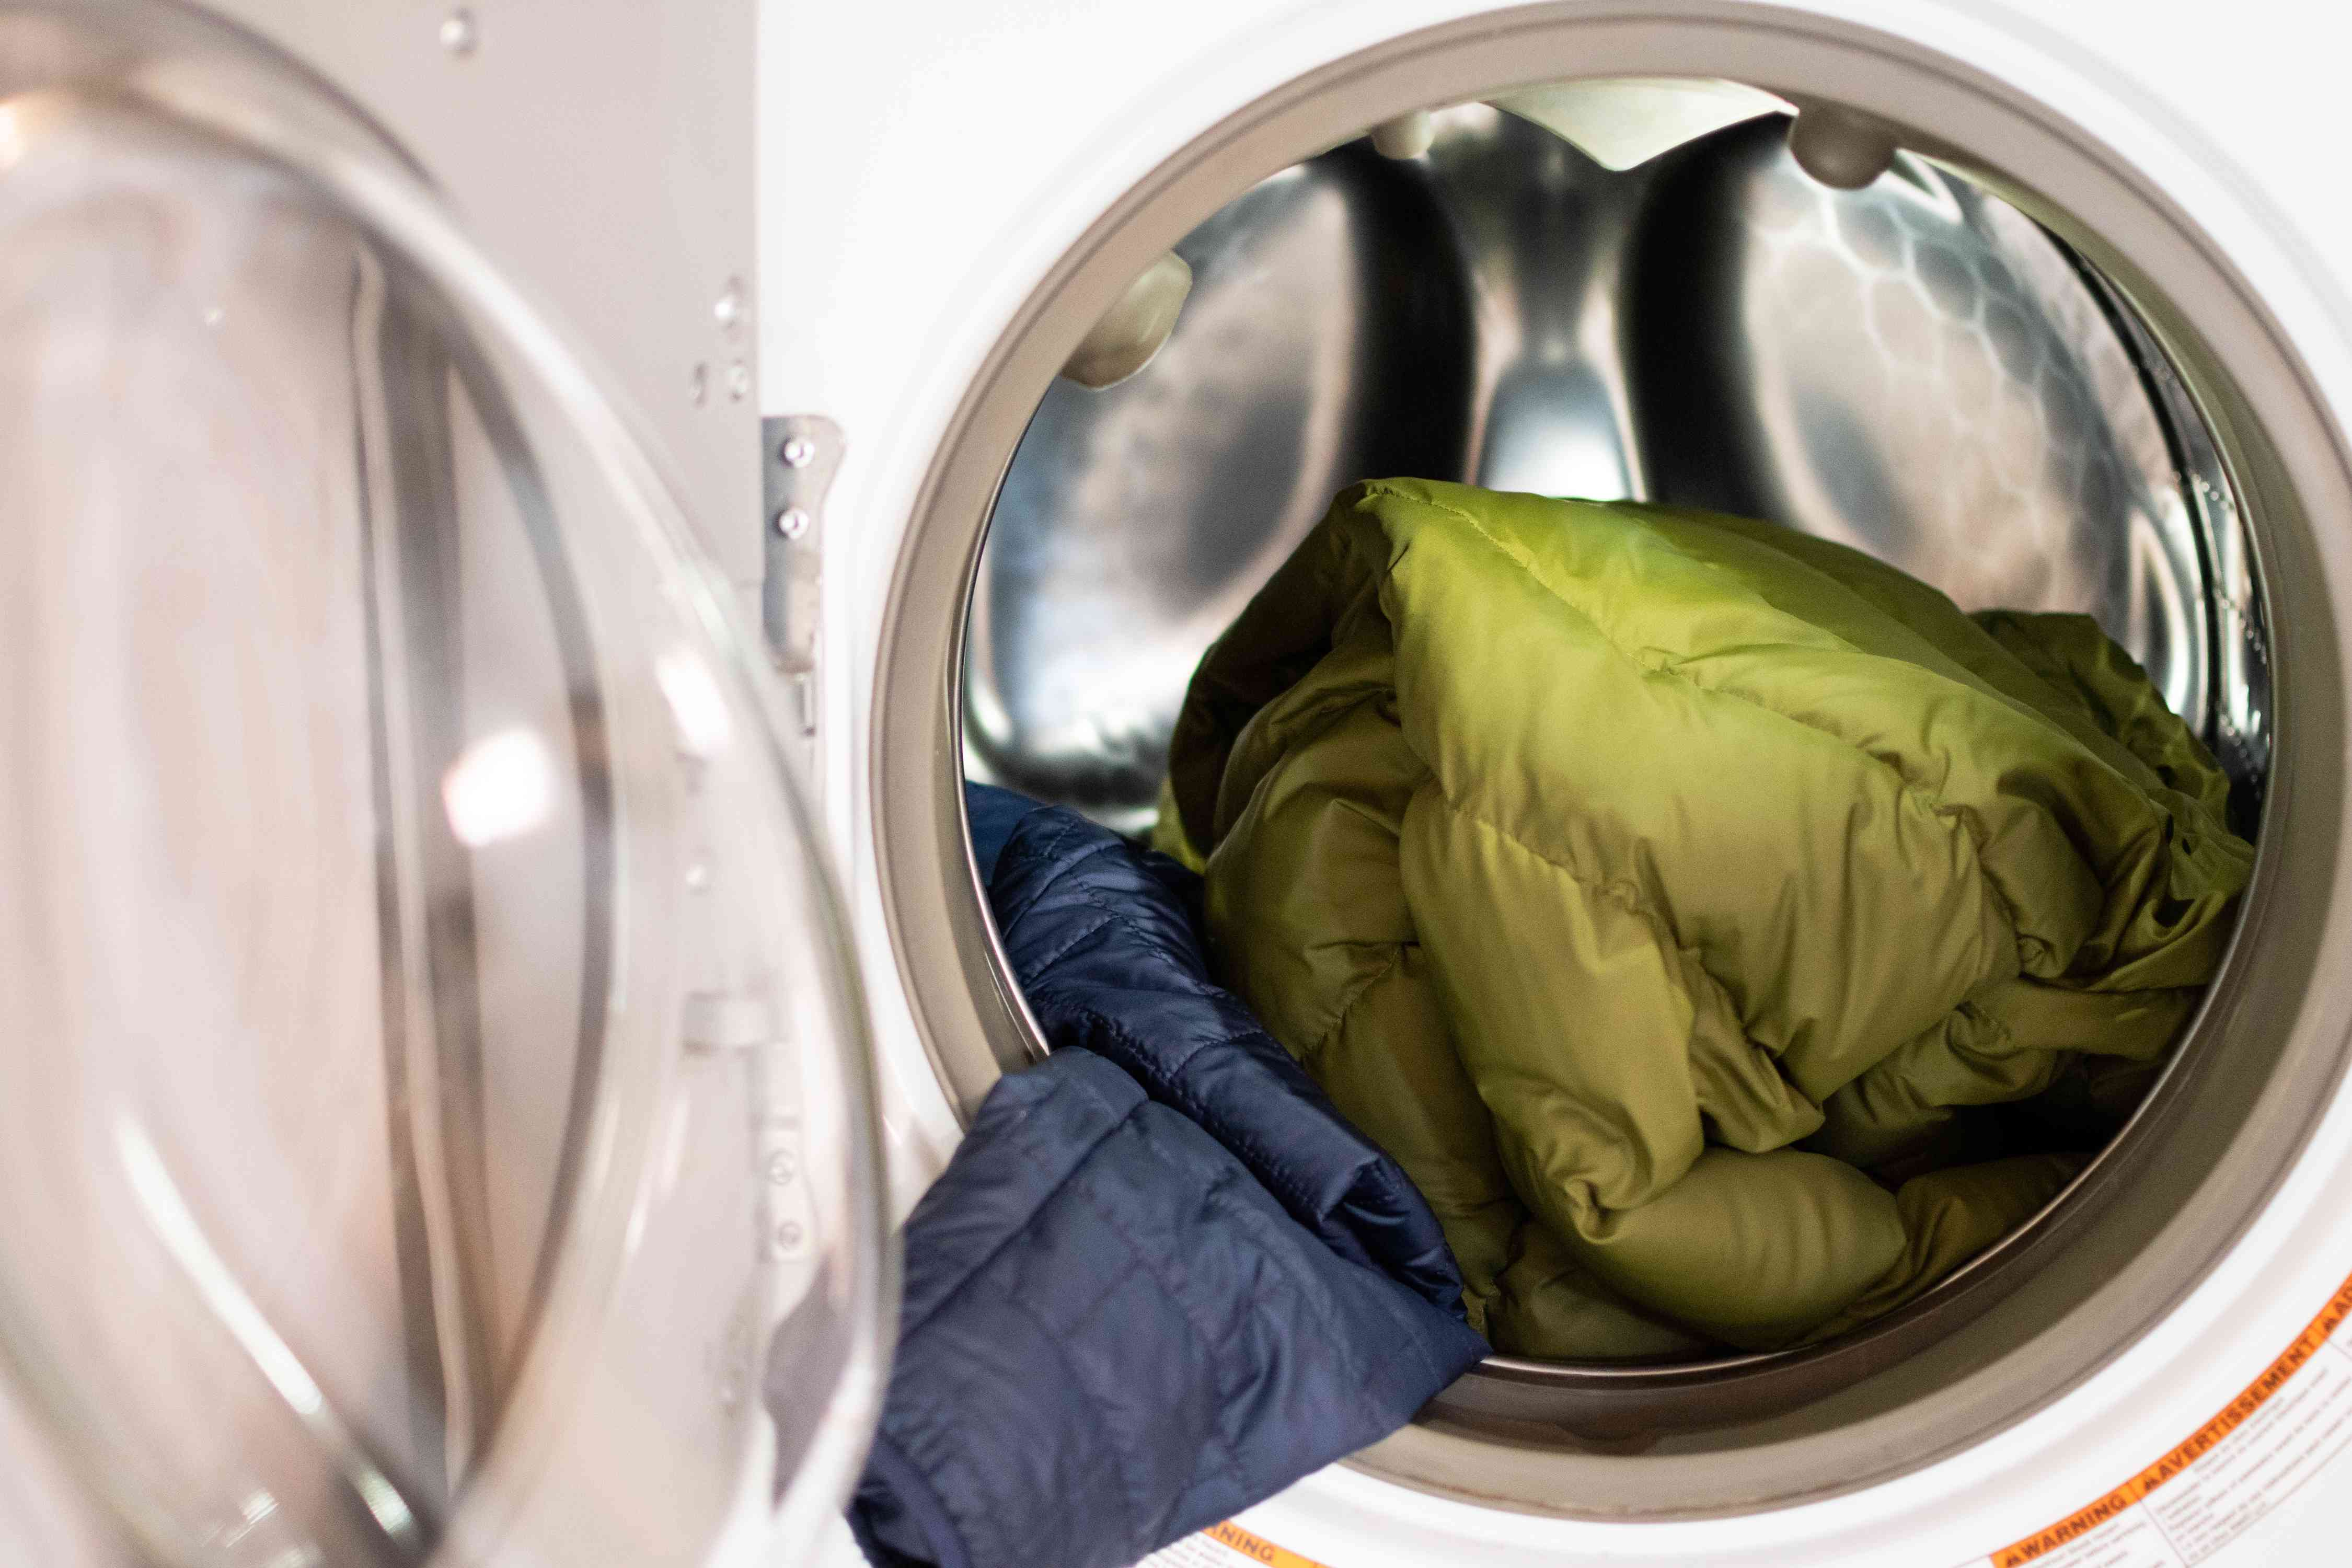 Green and blue down coats inside front facing washing machine